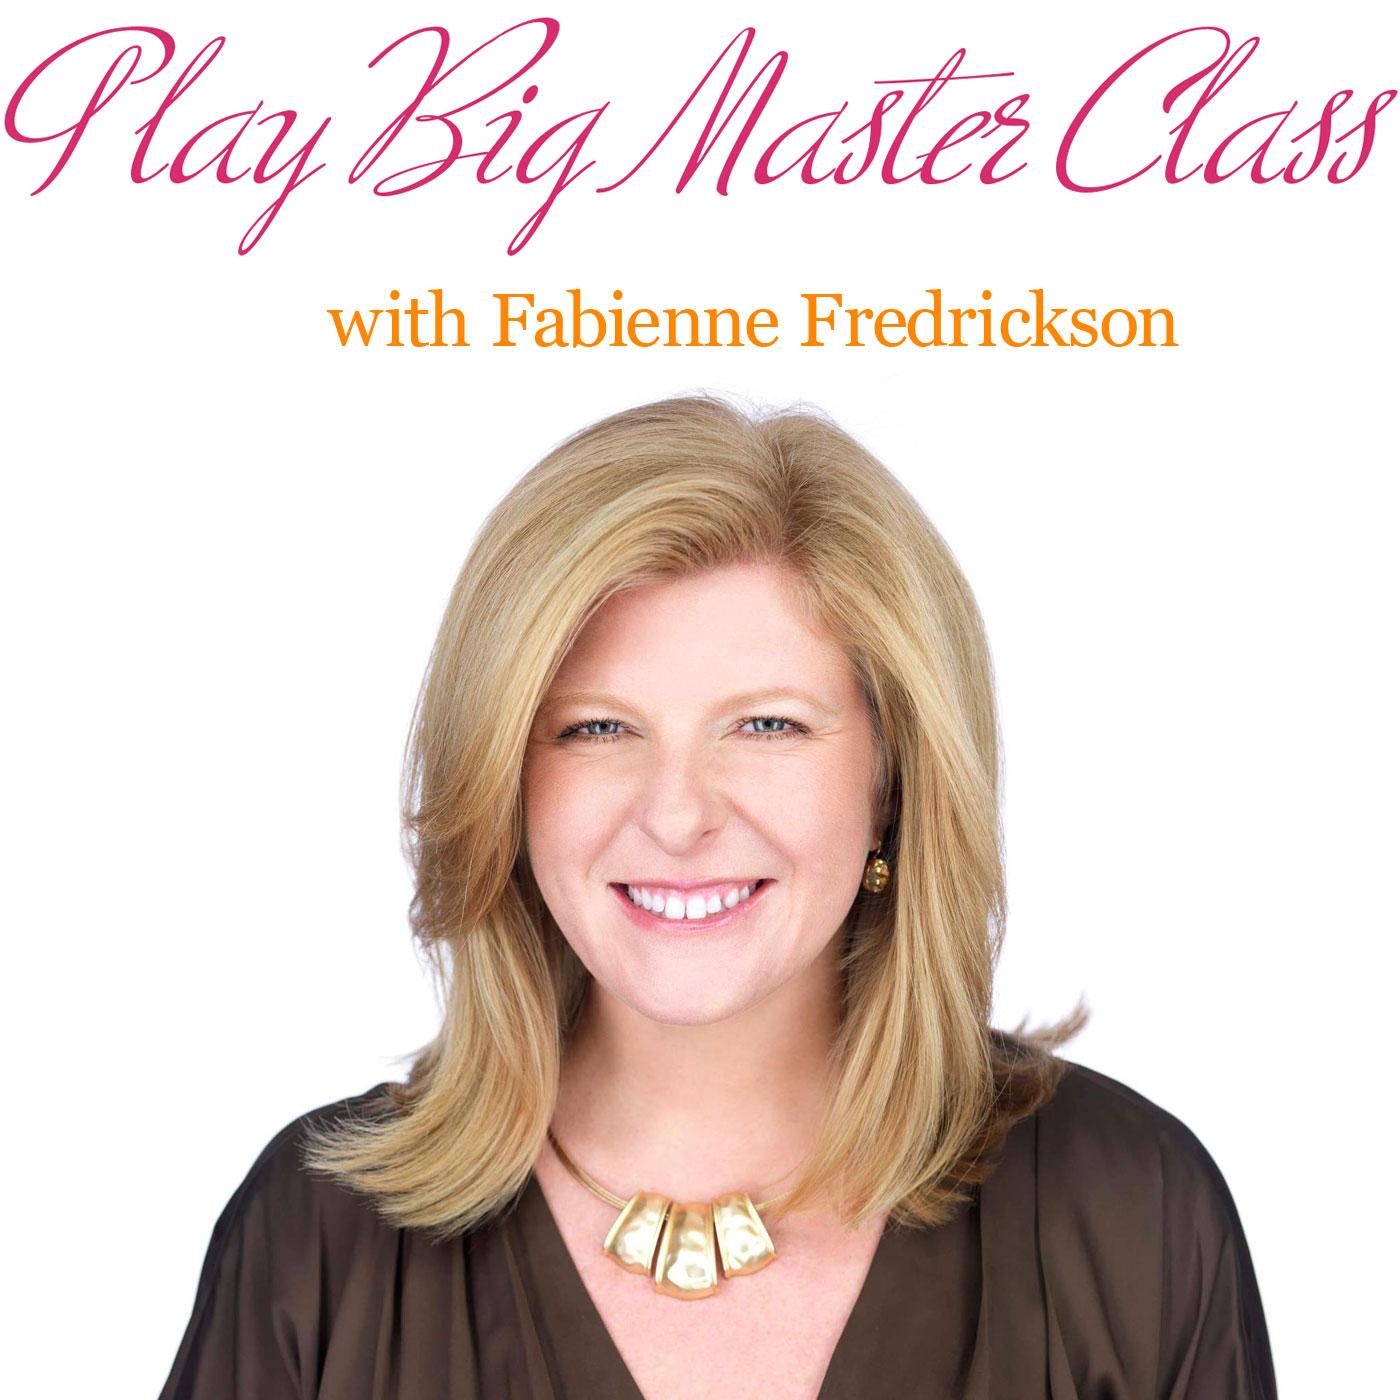 Play Big Master Class